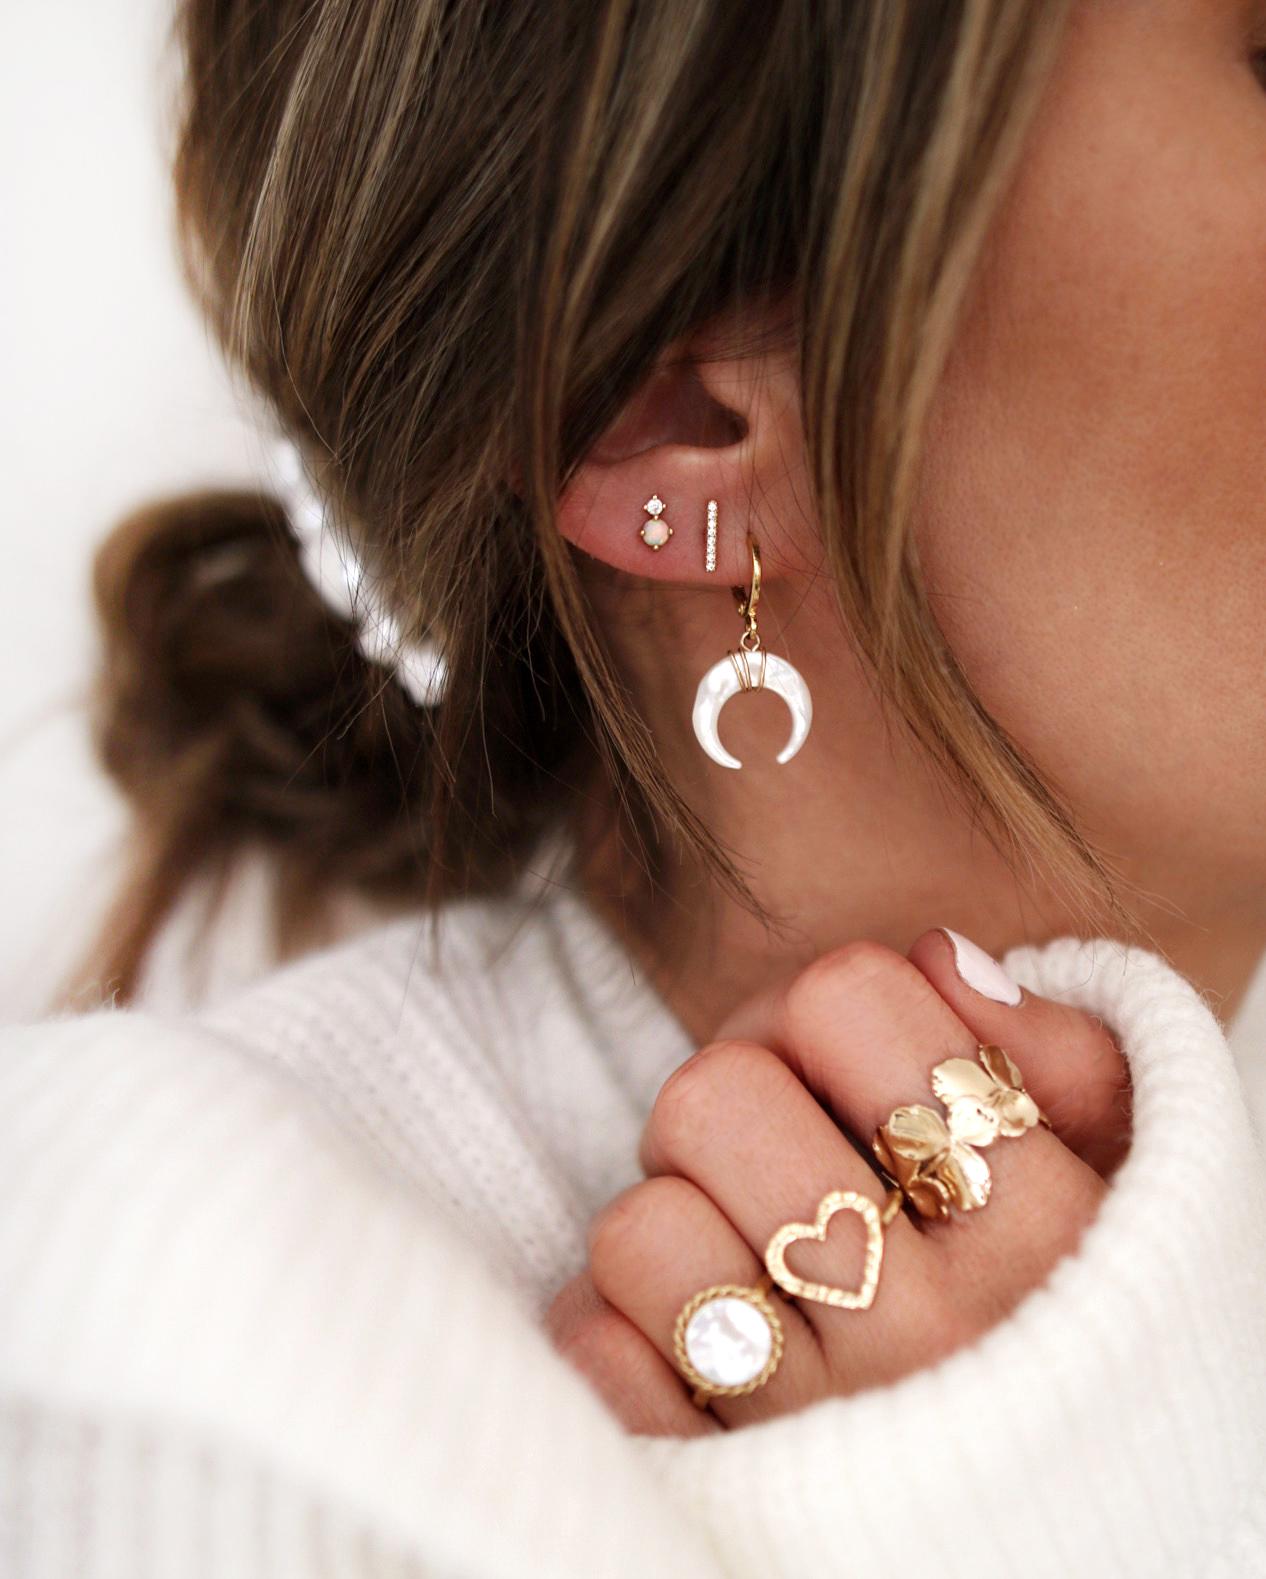 jewelry addict bijoux addict @chon.and.chon